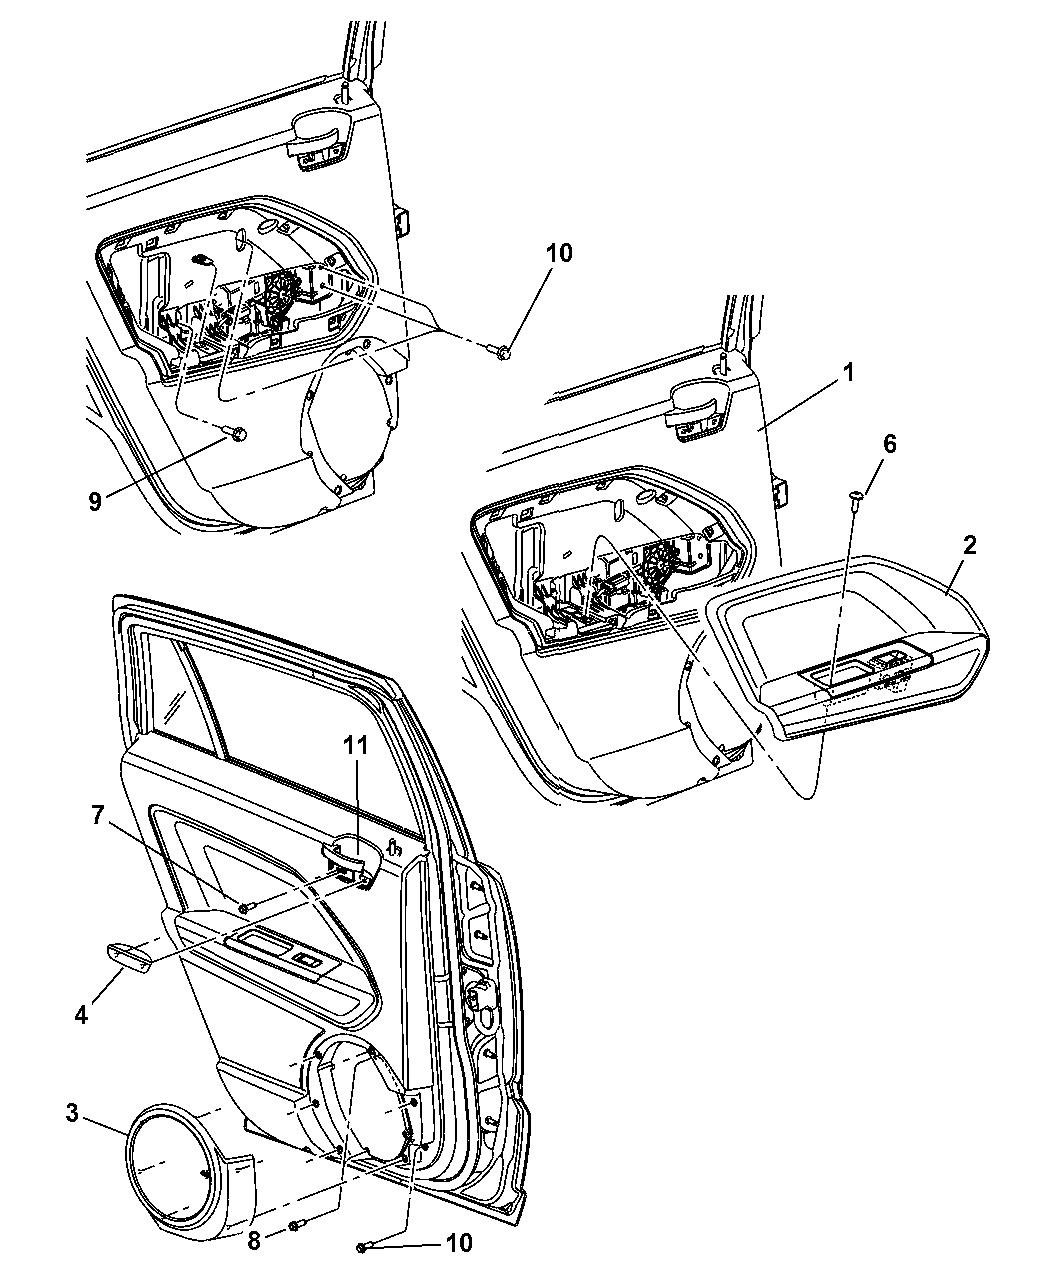 Decoratingspecial Com: Jeep Patriot Interior Trim Parts